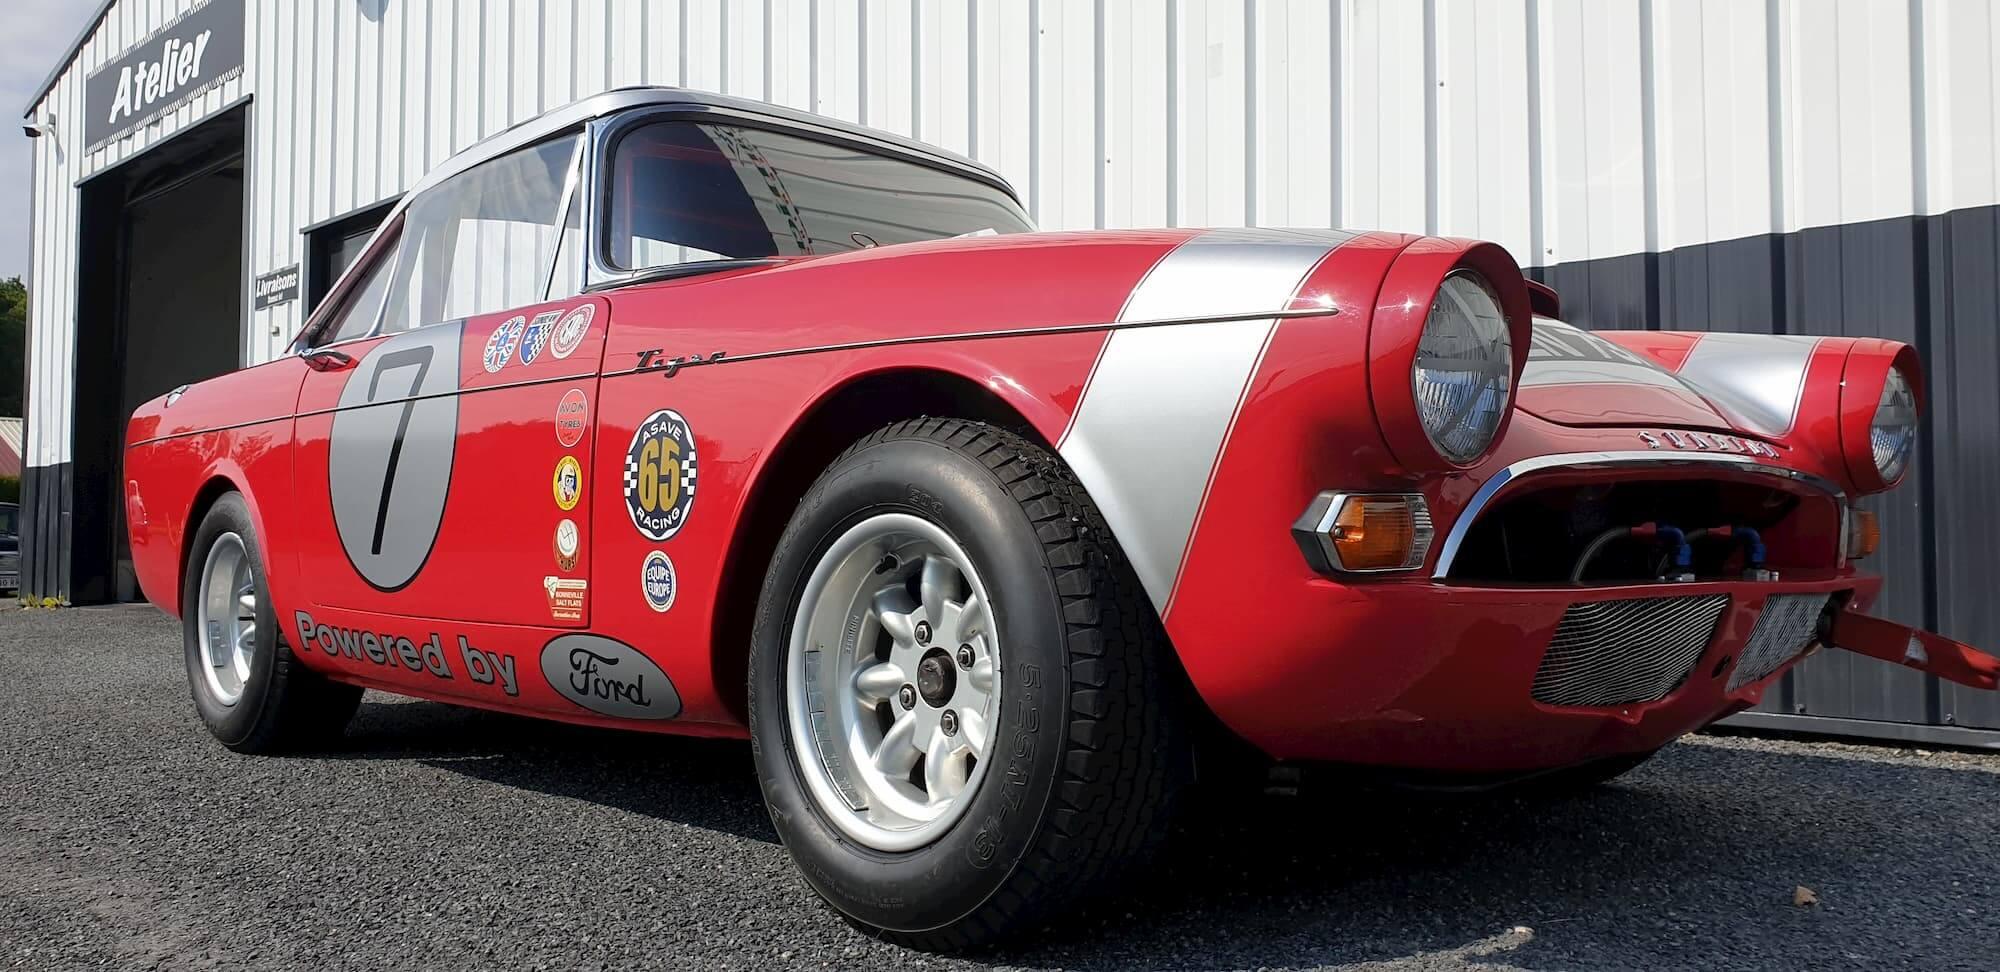 Sunbeam Tiger - Ford V8 - FIA - Race engineering - ASAVE 65 - Préparation et réglage chassis old british cars